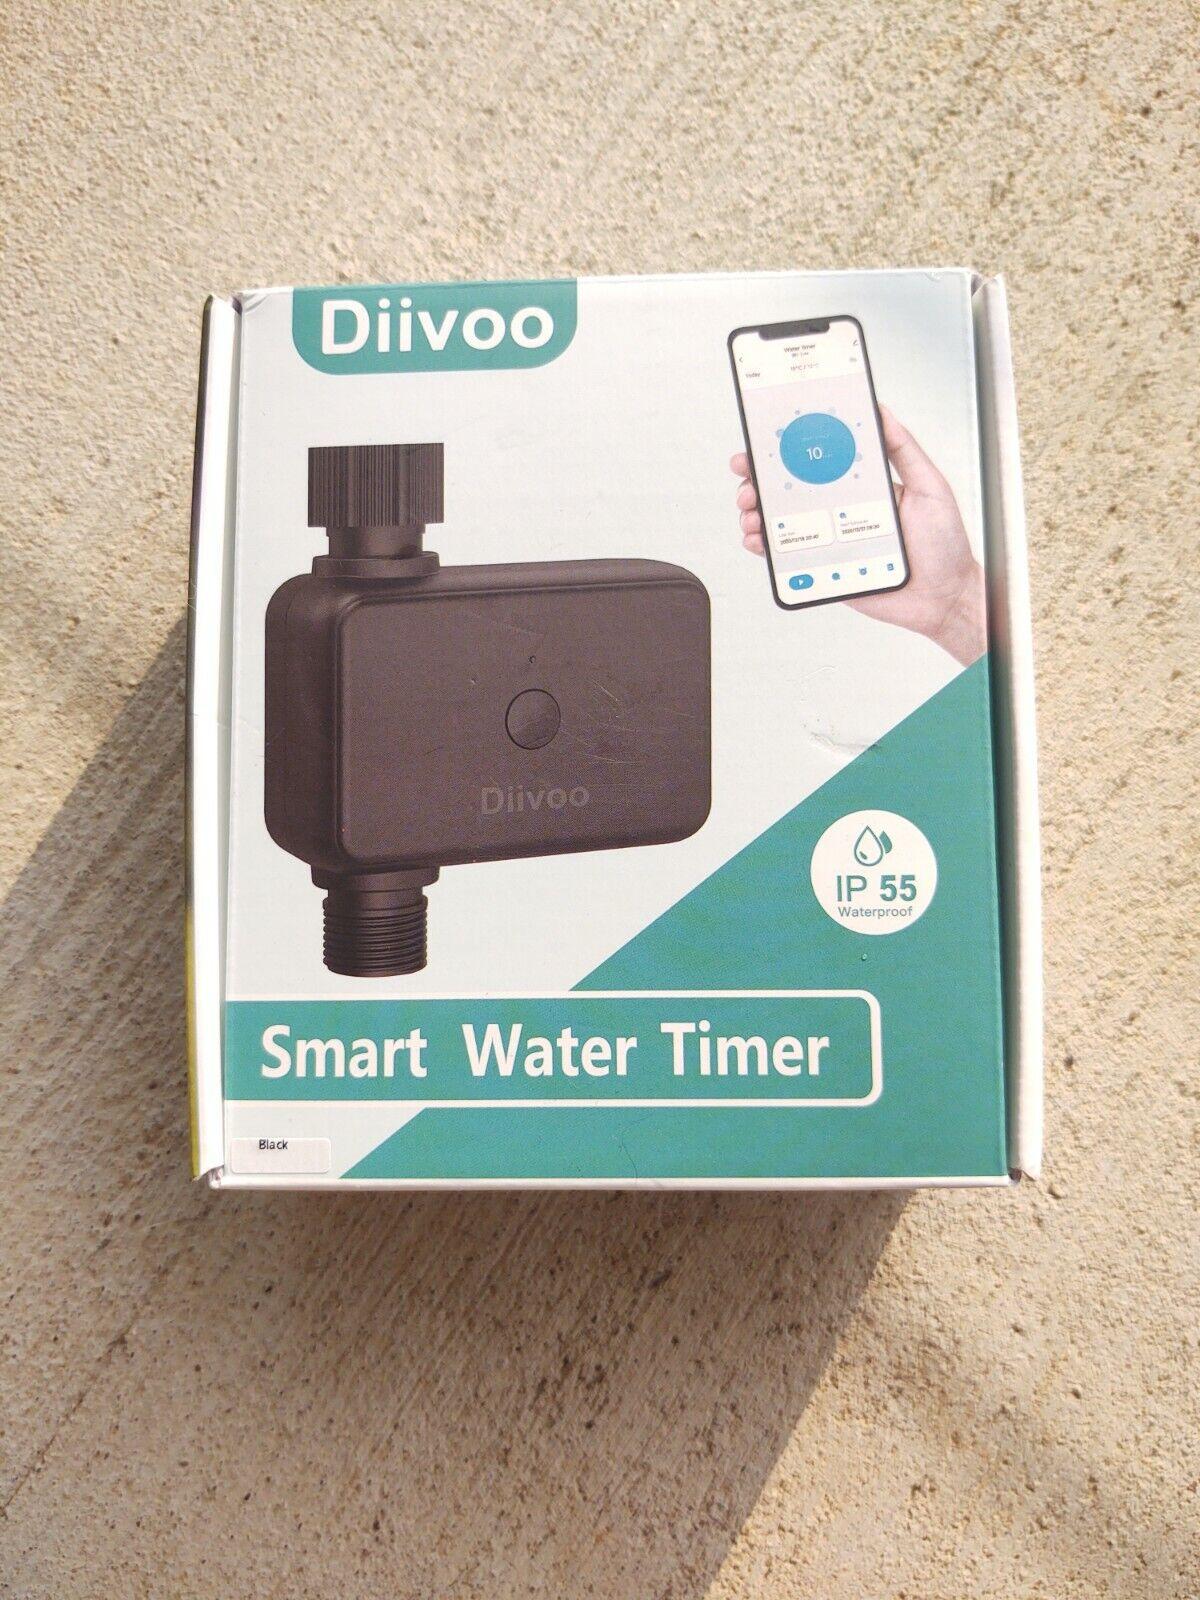 DIIVOO SMART WATER TIMER - Bluetooth Automatic Irrigation Sprinkler Garden